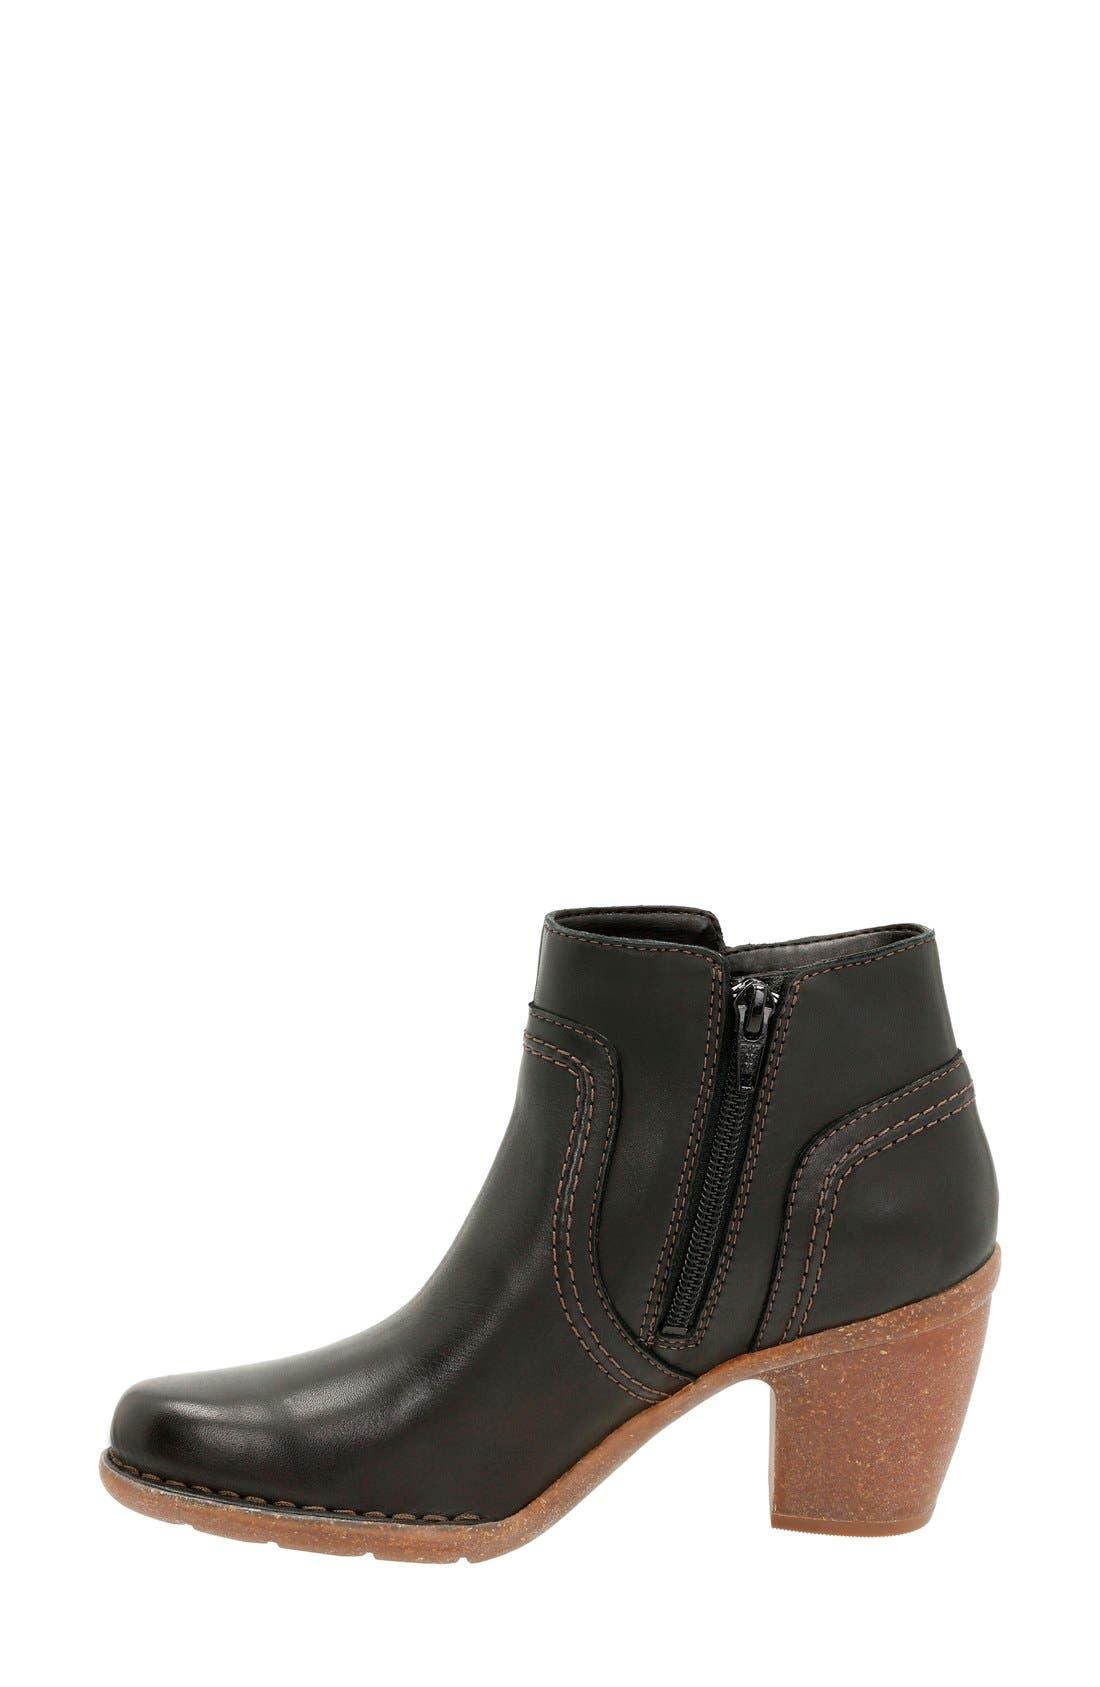 'Carleta Paris' Ankle Boot,                             Alternate thumbnail 2, color,                             Black Leather